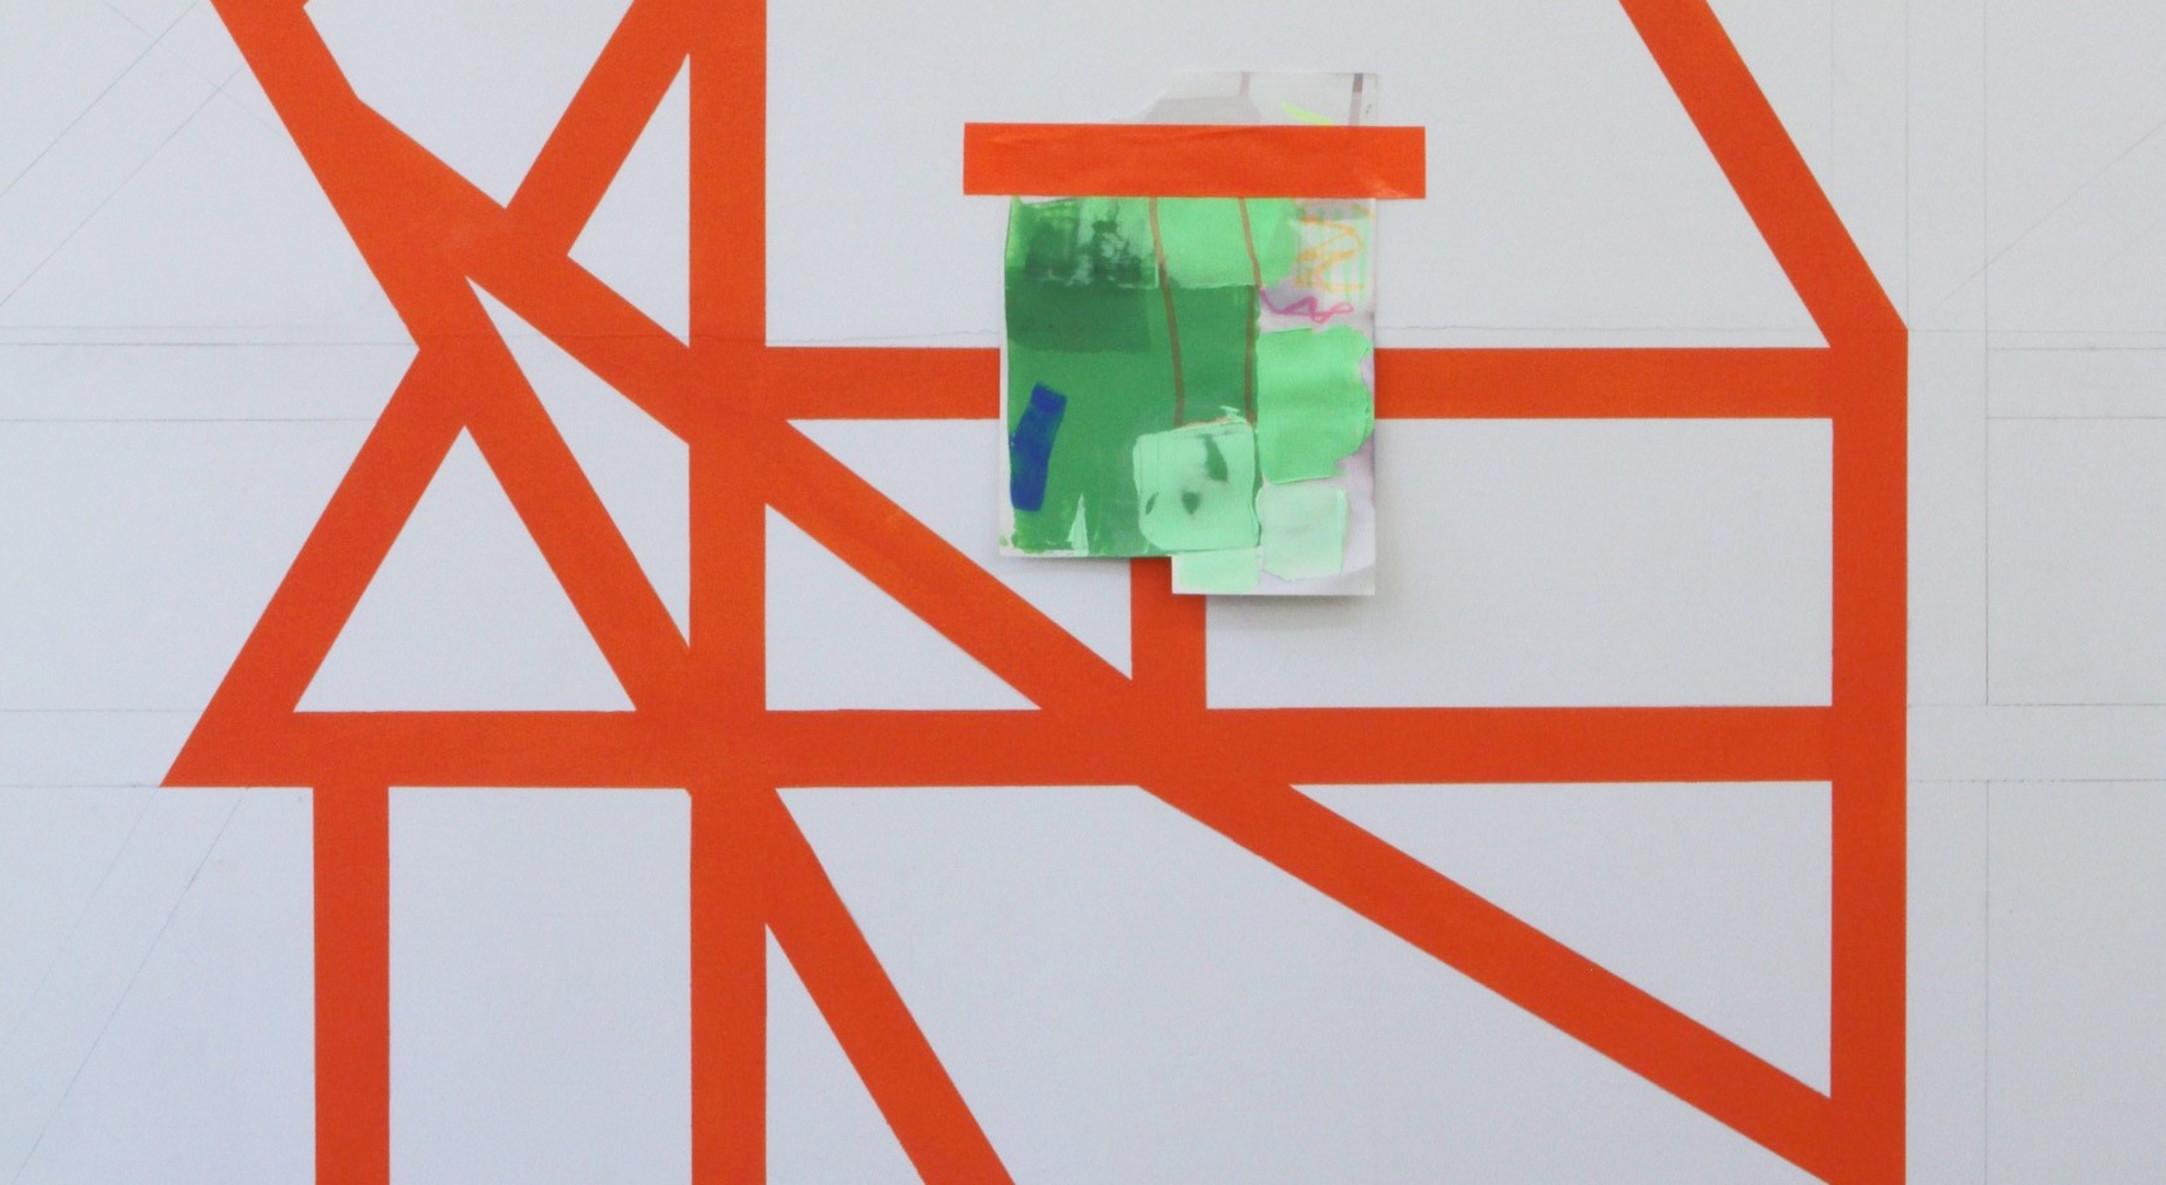 Andrew Bick, Studio wall drawing test #1, 2015